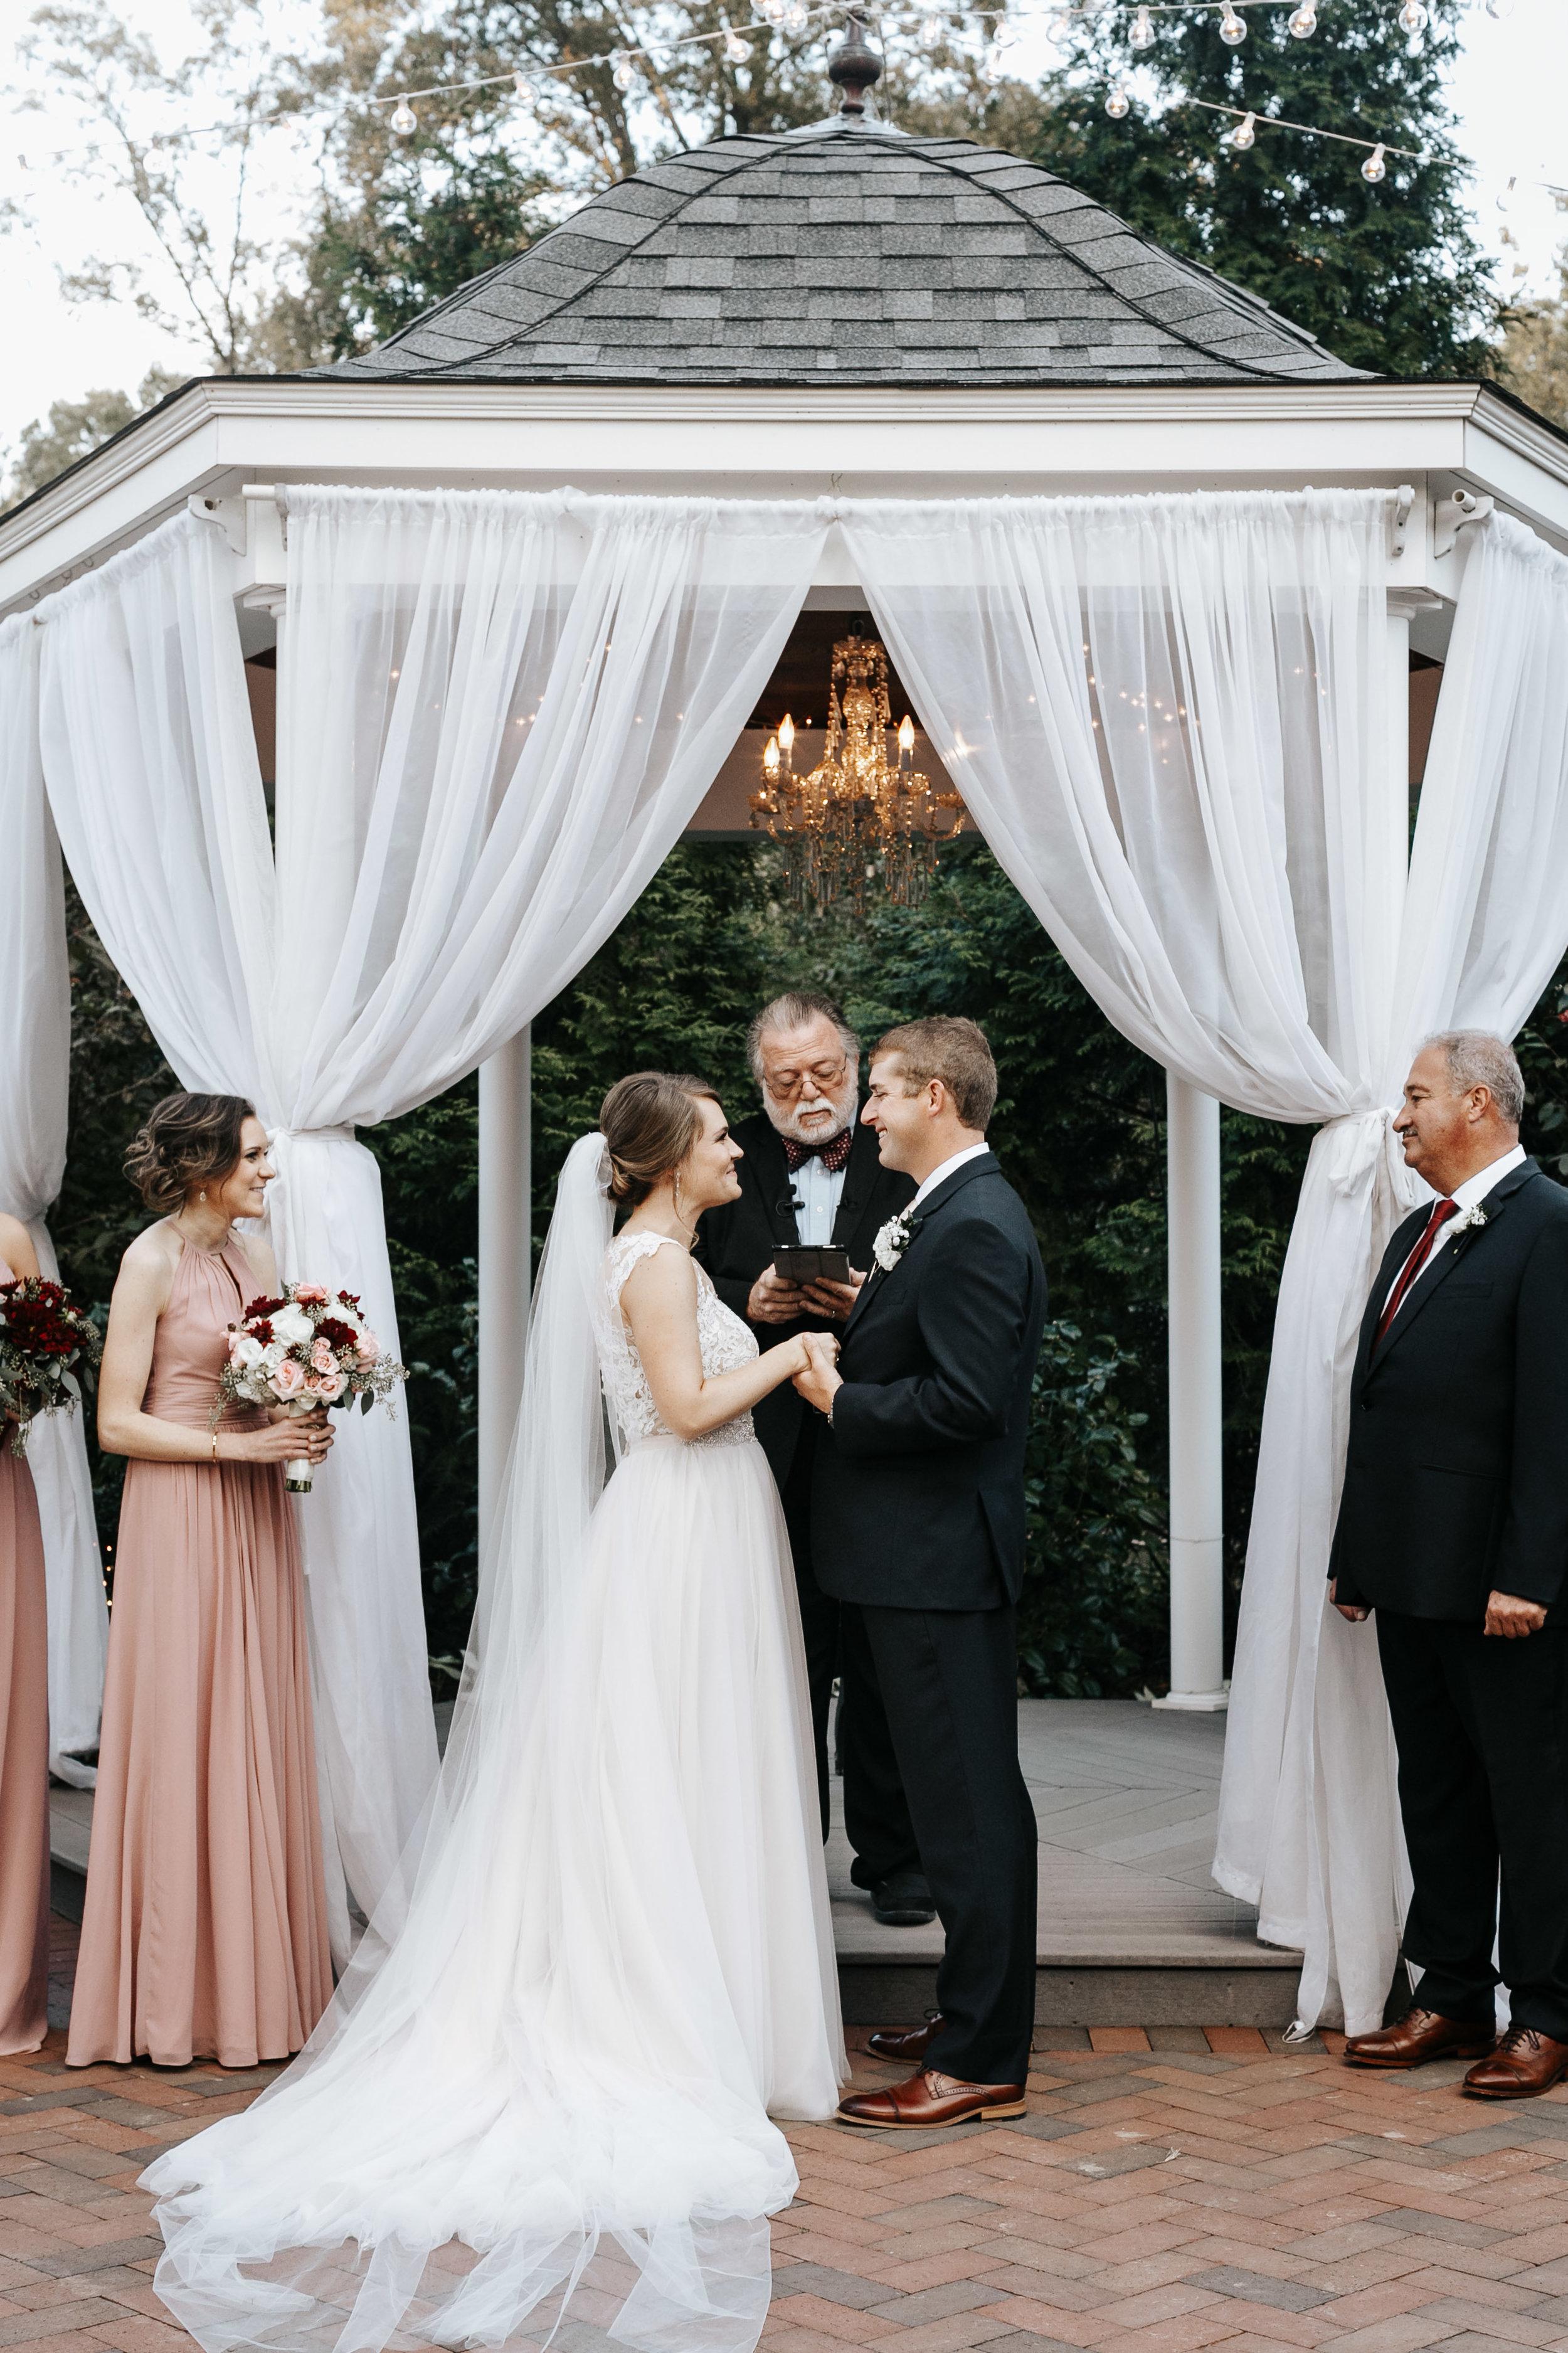 jessicabrandonwedding-36.jpg